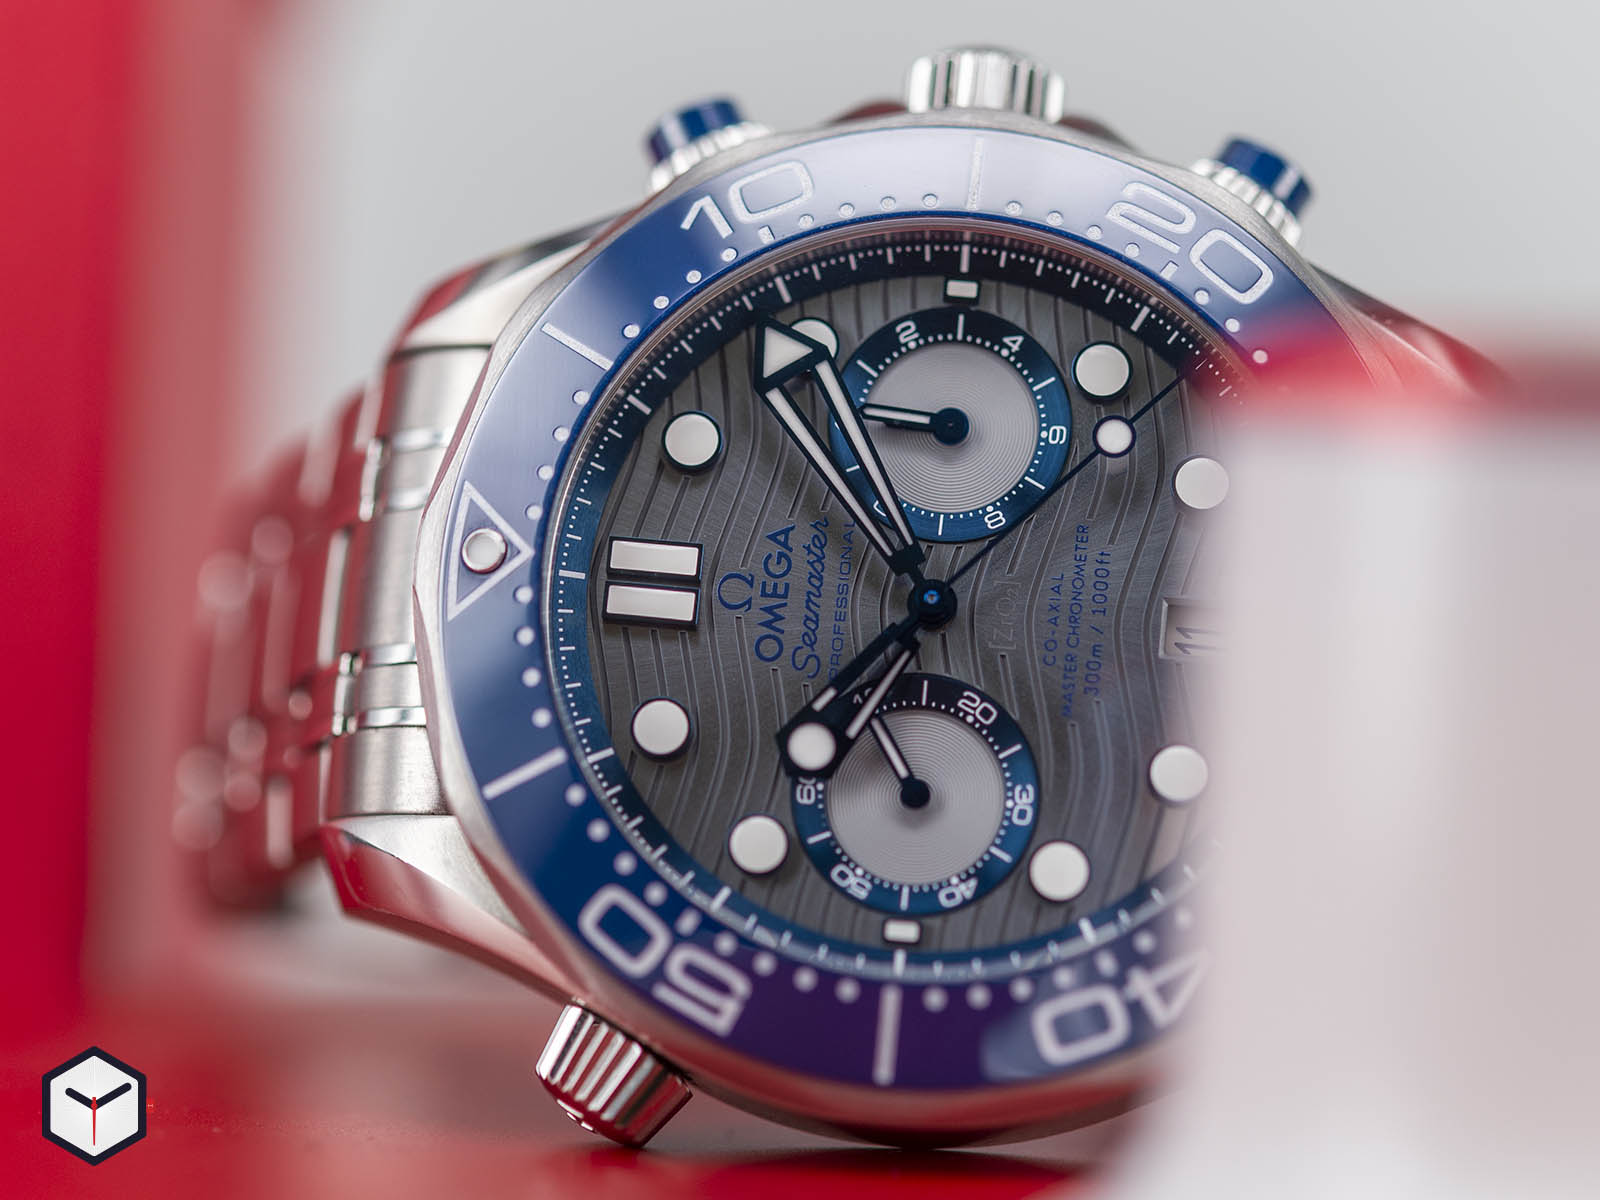 210-30-44-51-06-001-omega-diver-300m-co-axial-master-chronometer-chronograph-44-2.jpg